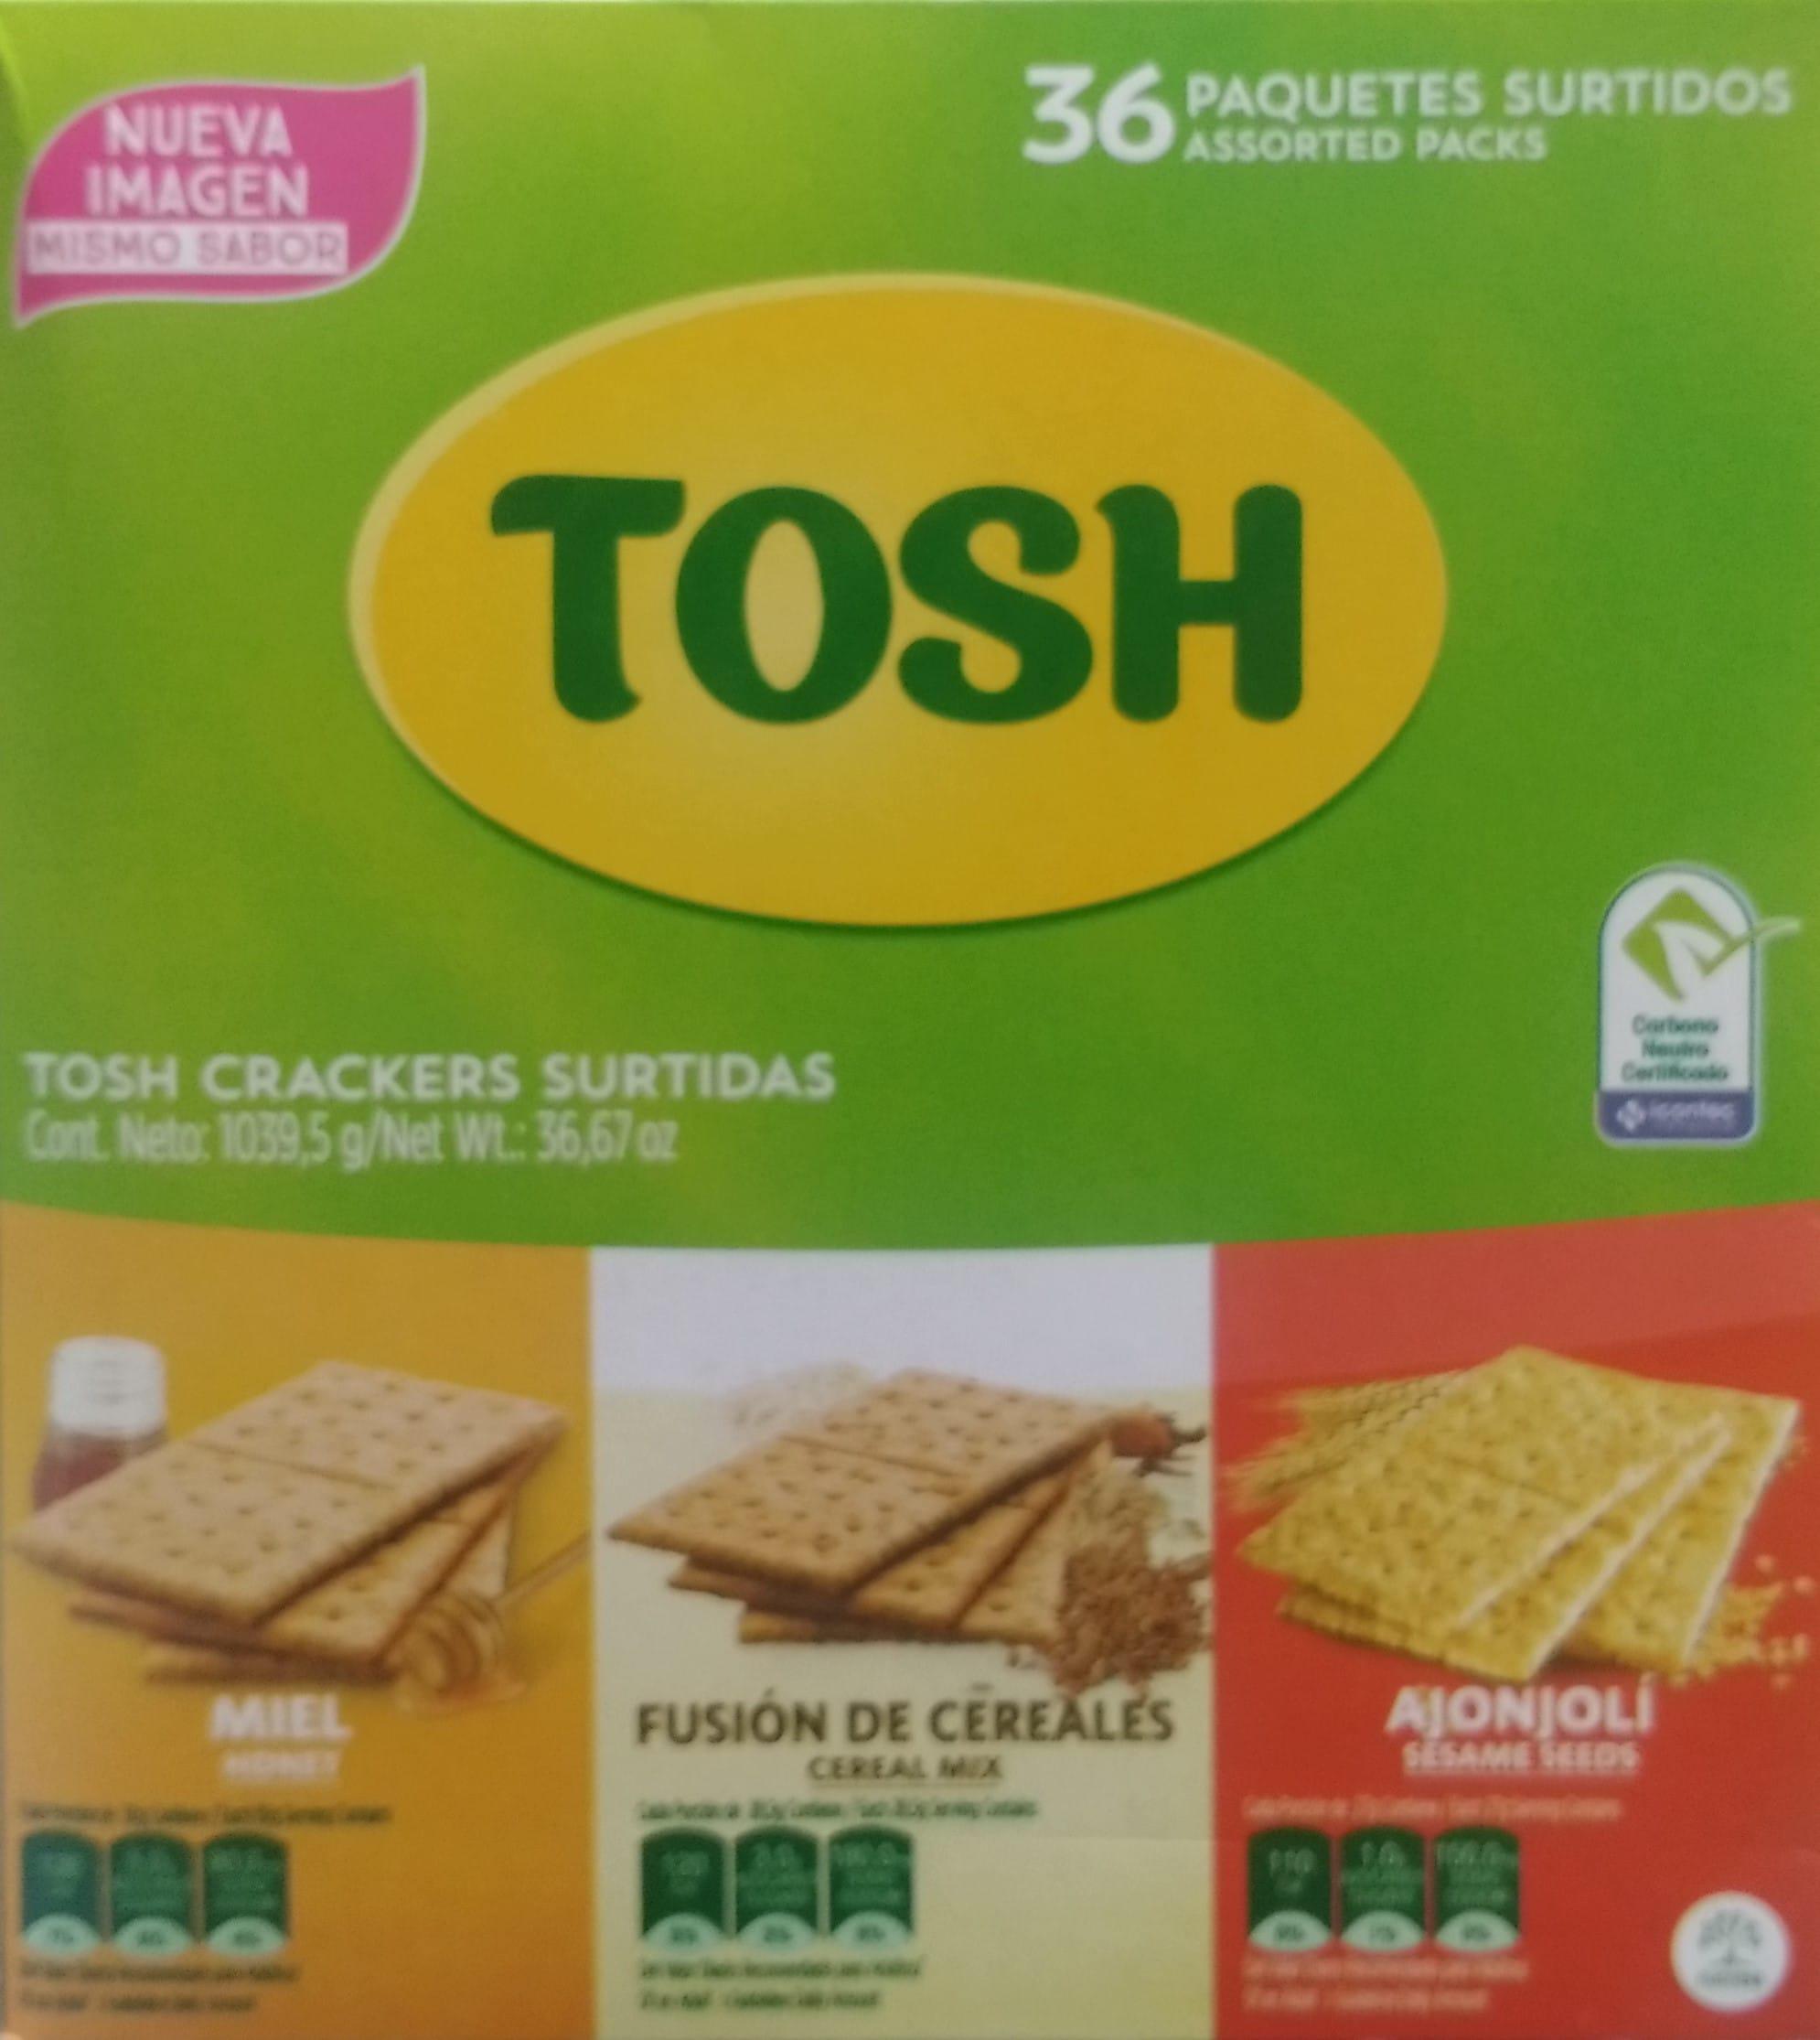 Galletas Tosh Crackers Surtidas x 36 1039 5g